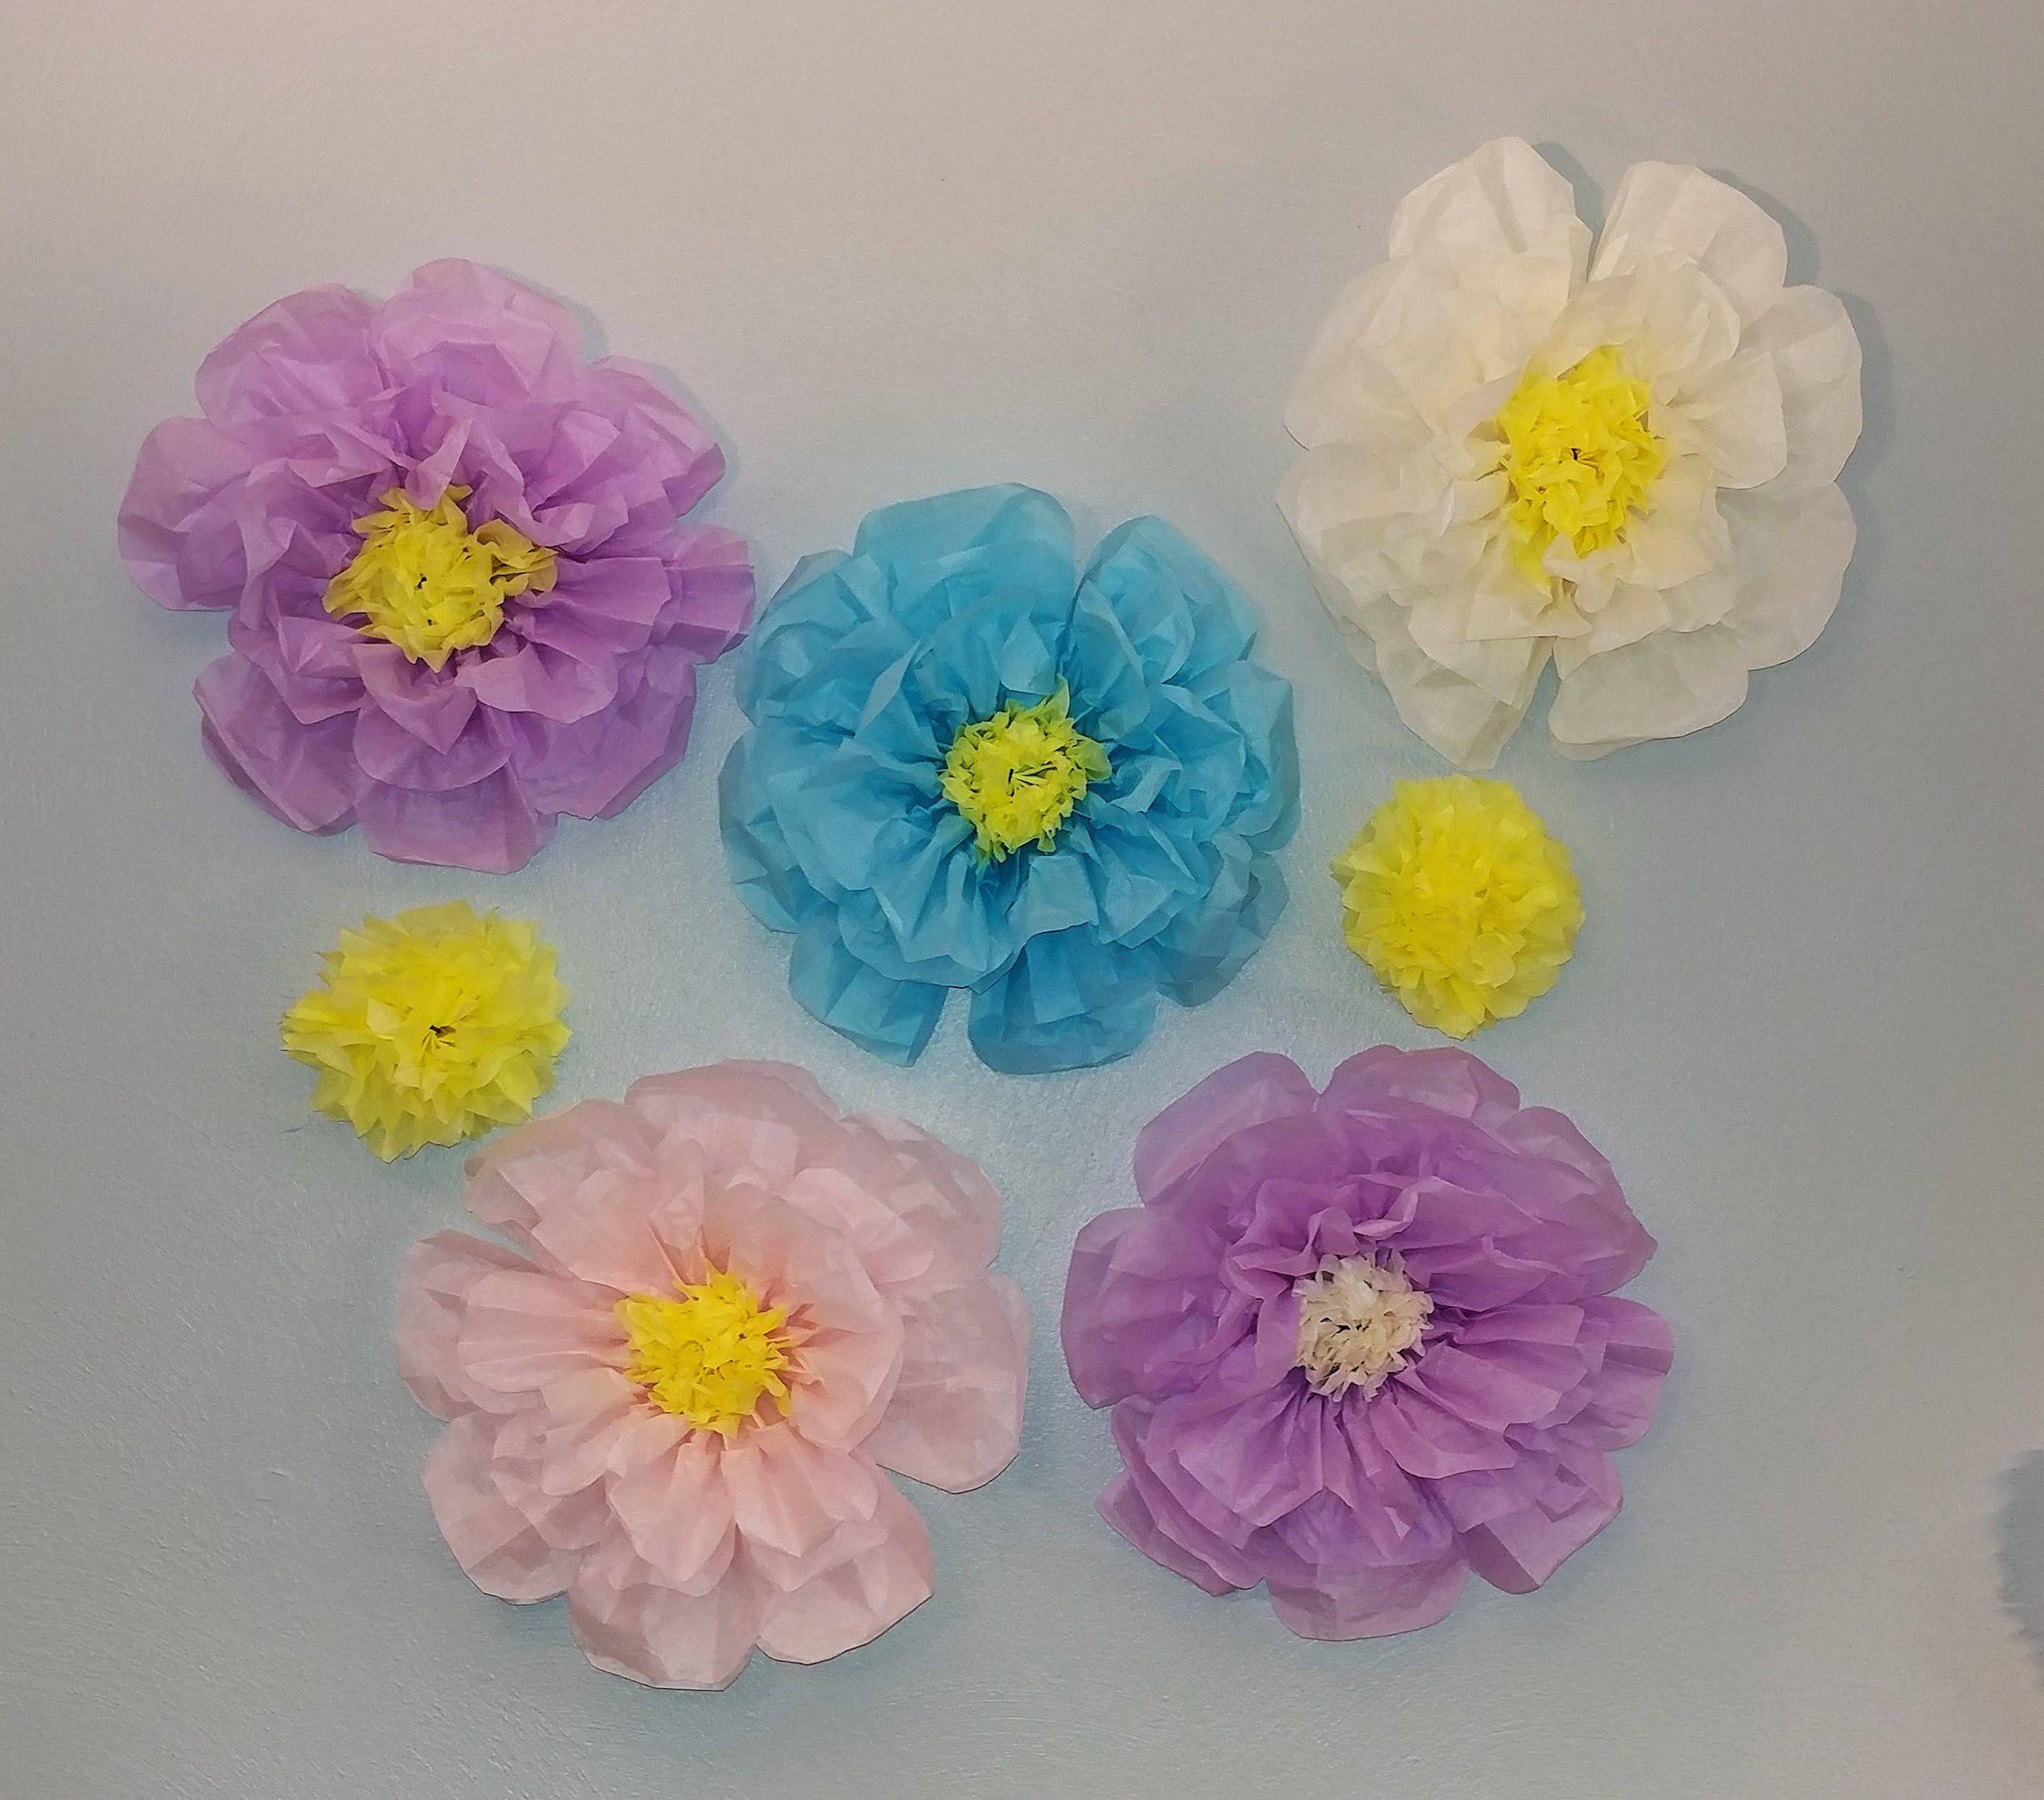 Diy paper flower wedding decorations  Handmade Spring Flowers Tissue Paper Flowers Wedding Decor Shower